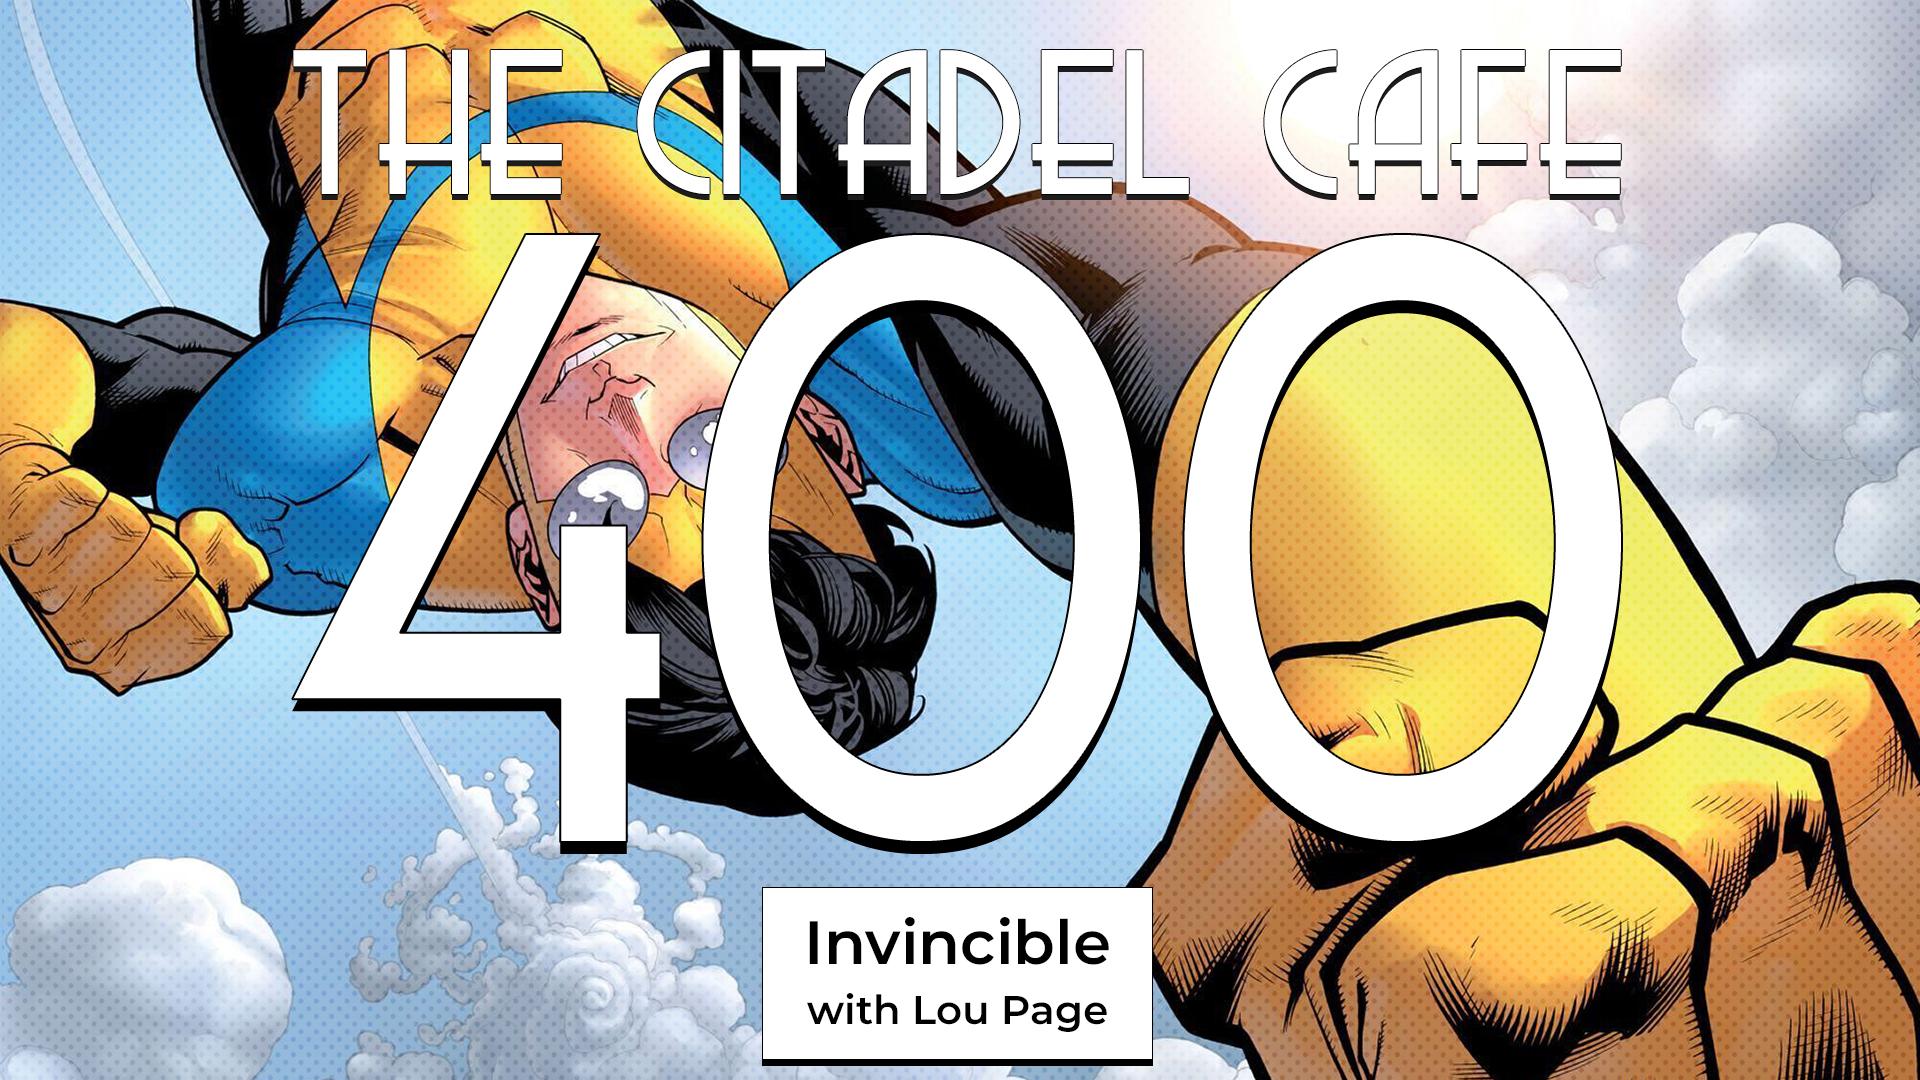 The Citadel Cafe 400: Invincible